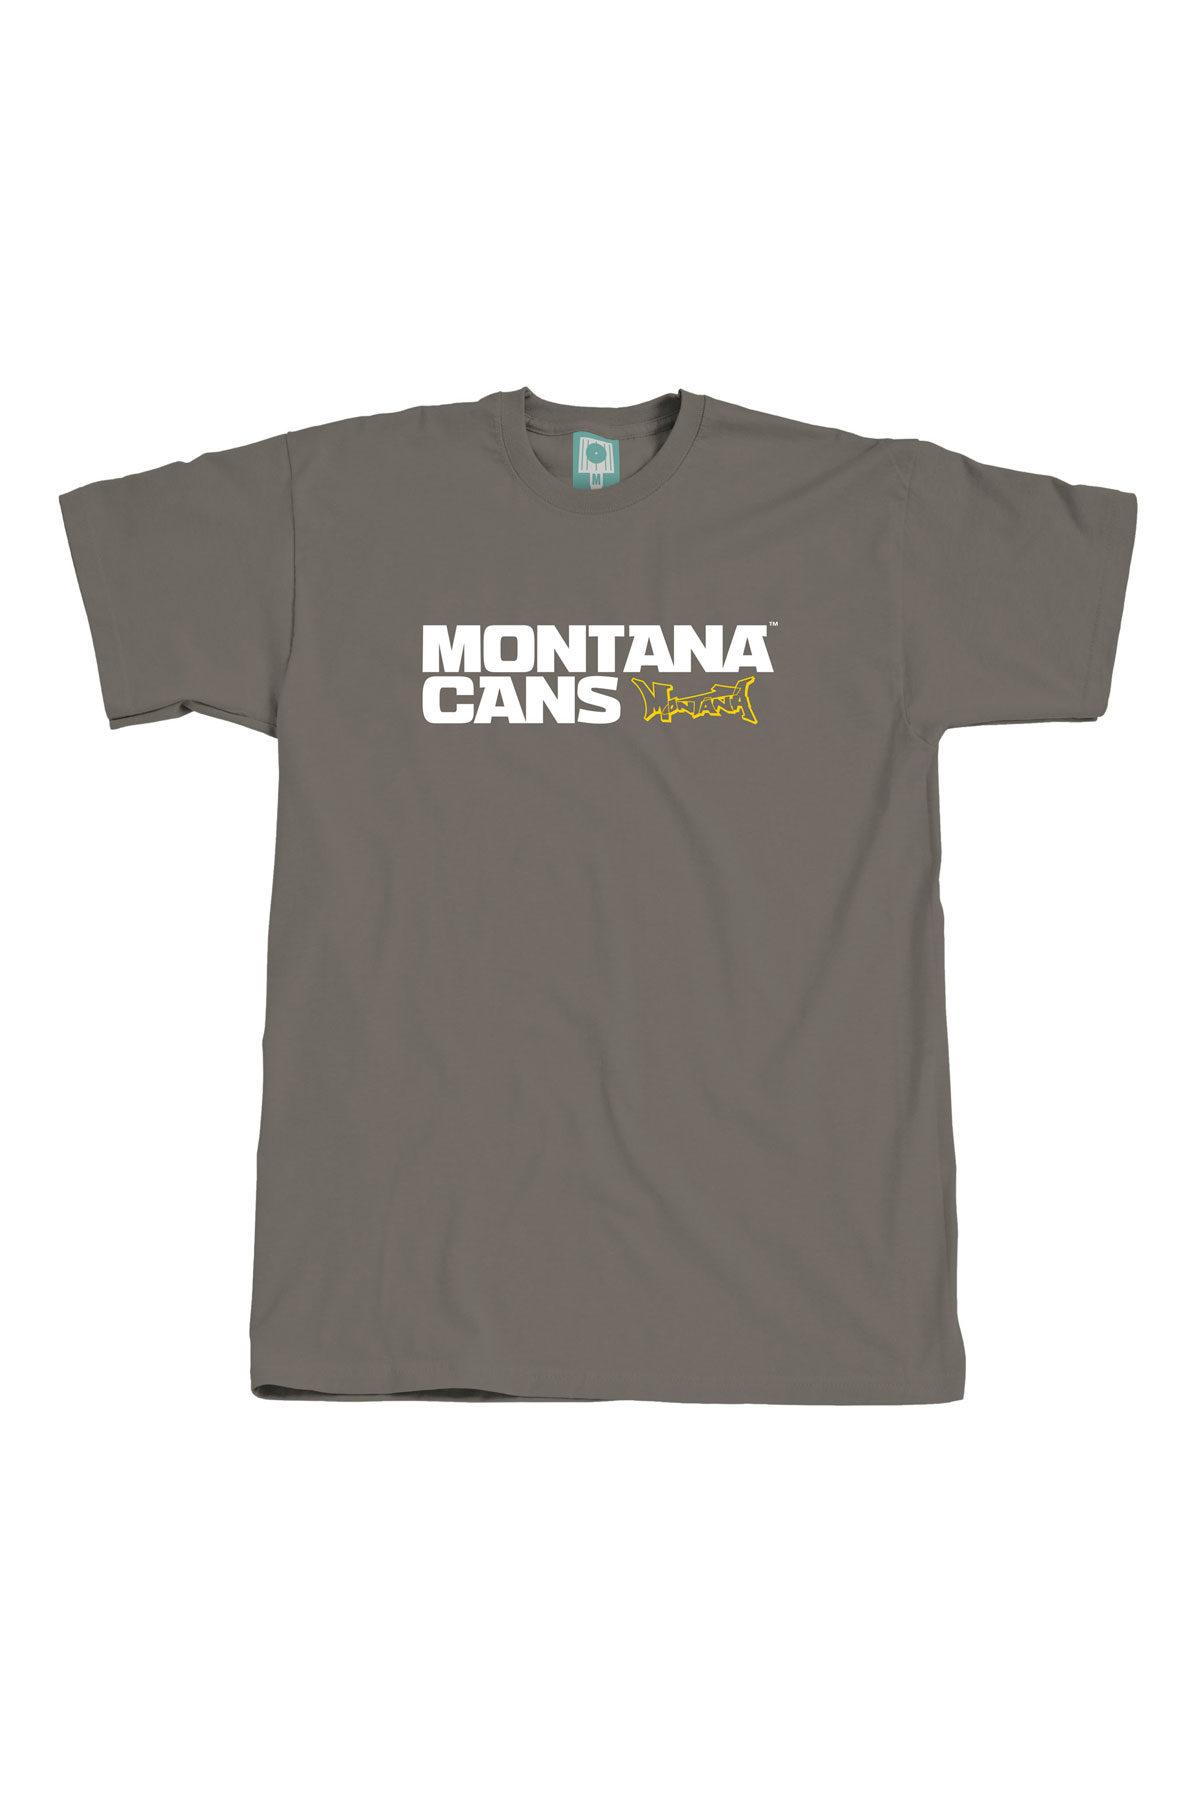 Montana TYPO+LOGO Meteor T-Shirt